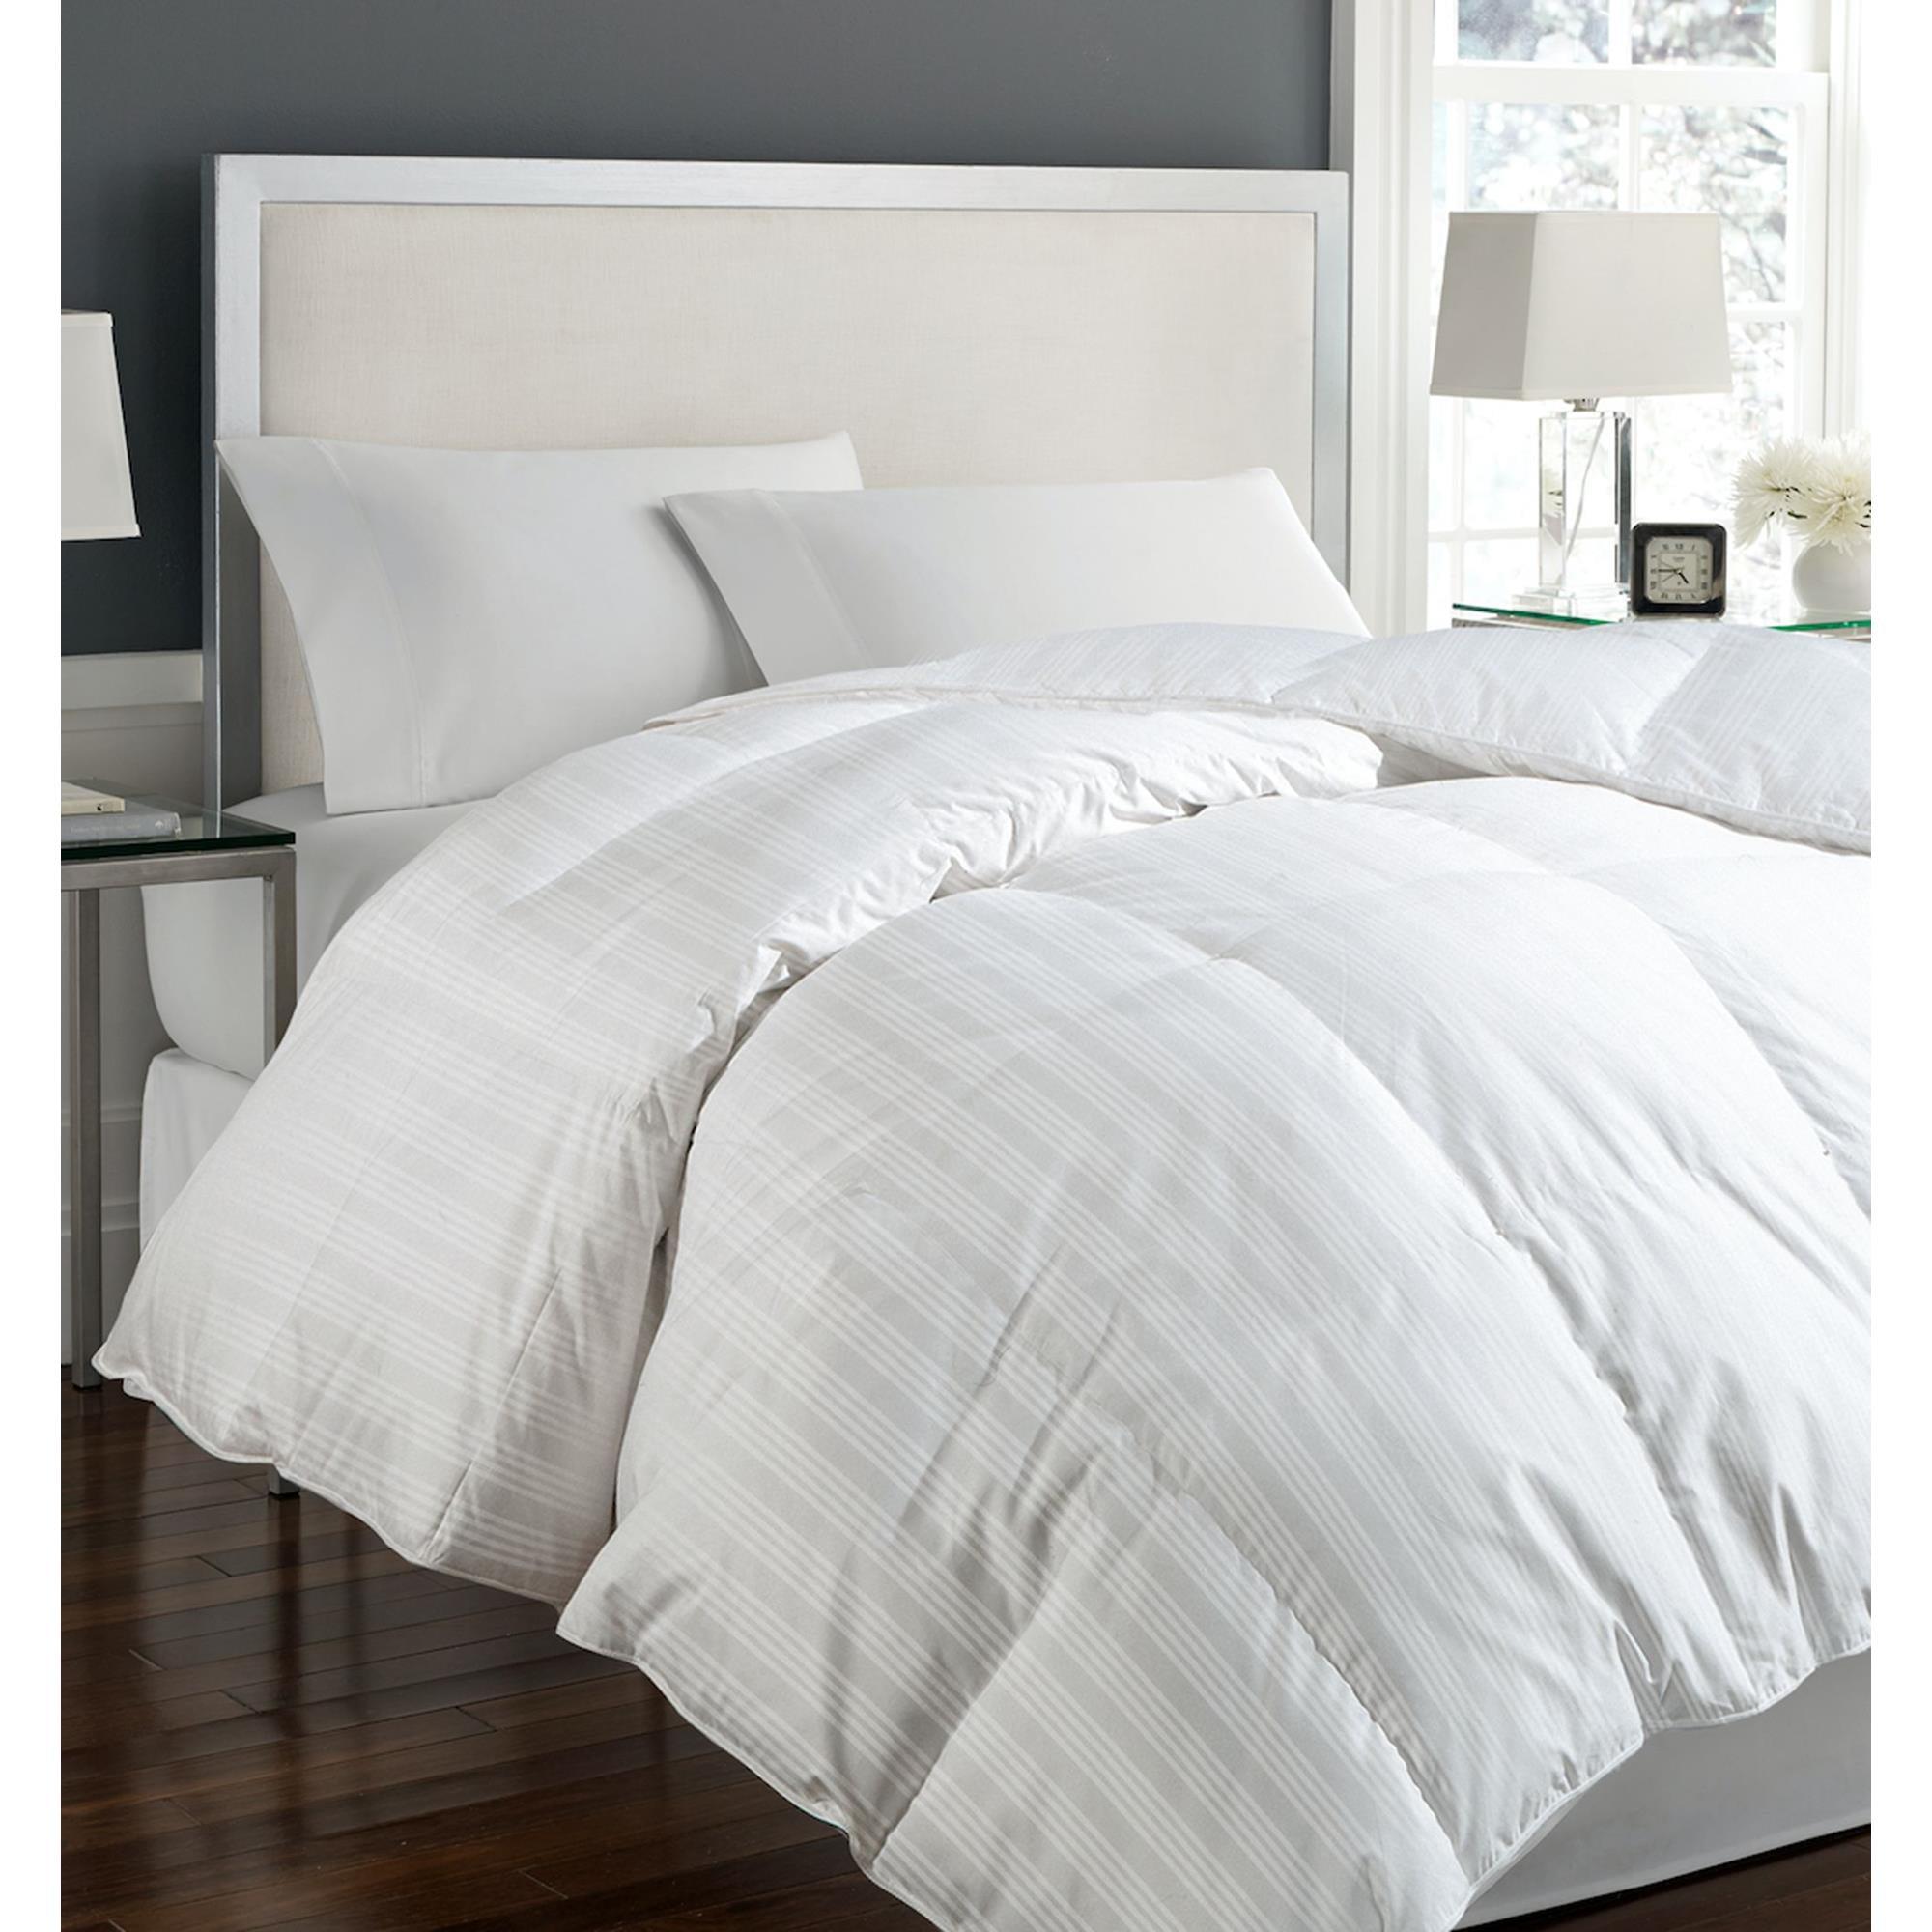 400T 100% Cotton Tuxedo Damask Cover White Down Comforter...